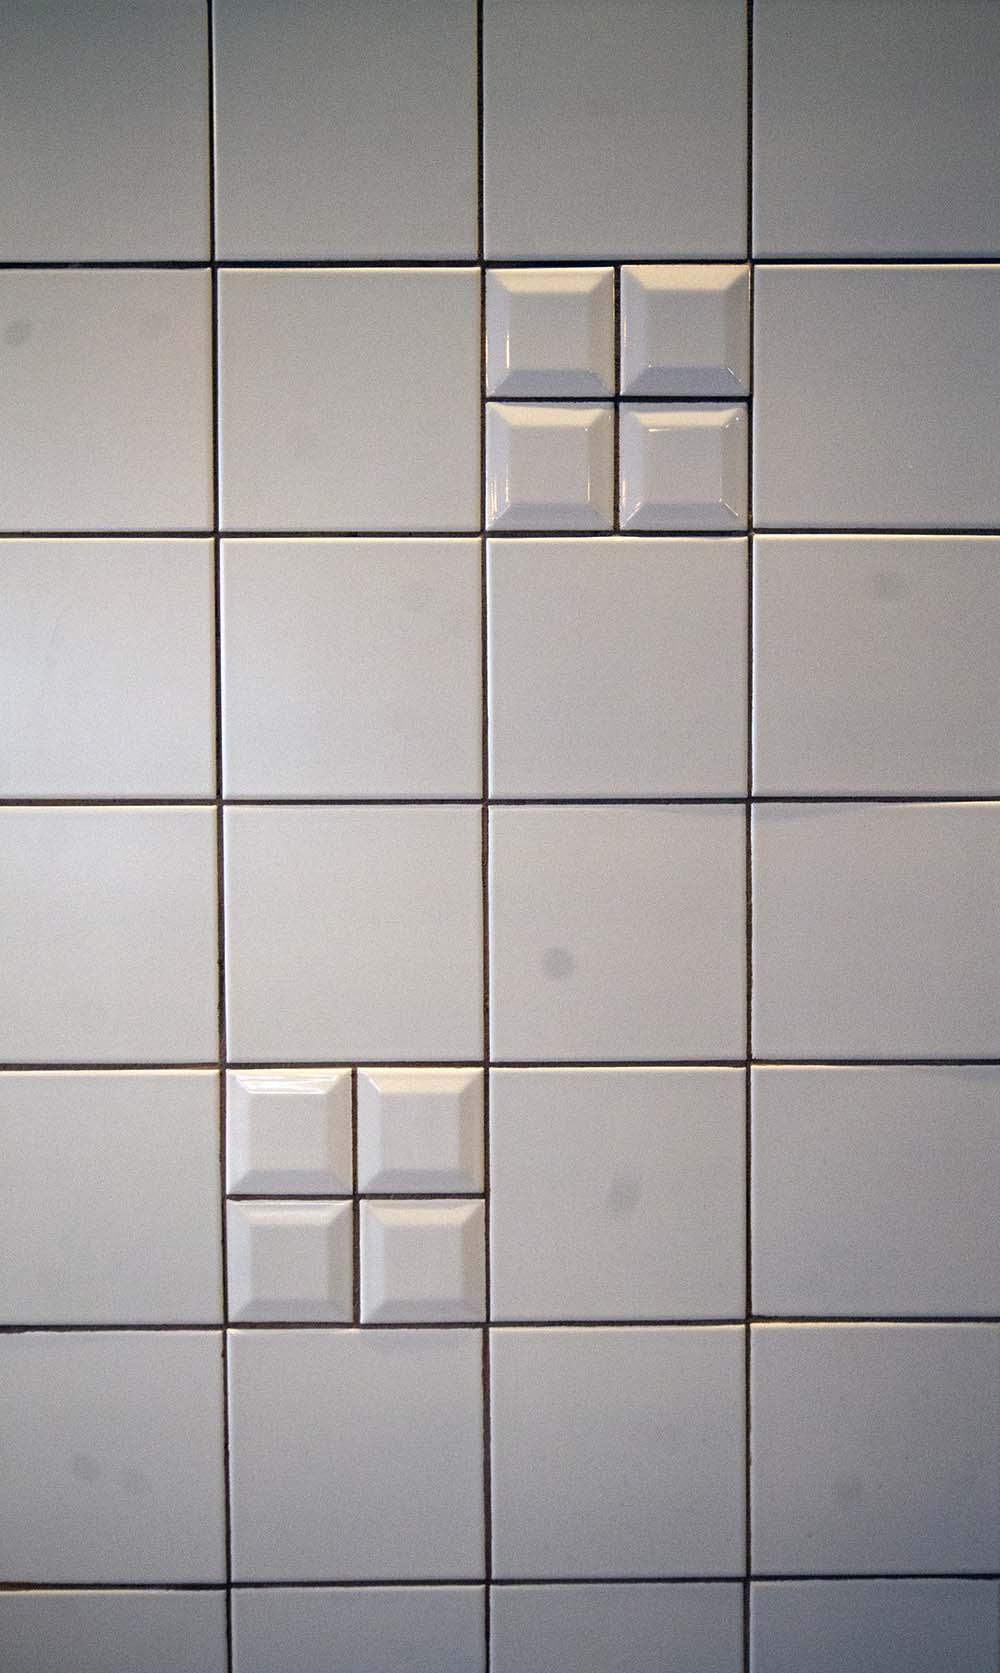 Detalle pachwork cerámica 09 restaurante BOVINO GIJON Da2 Arquitectura